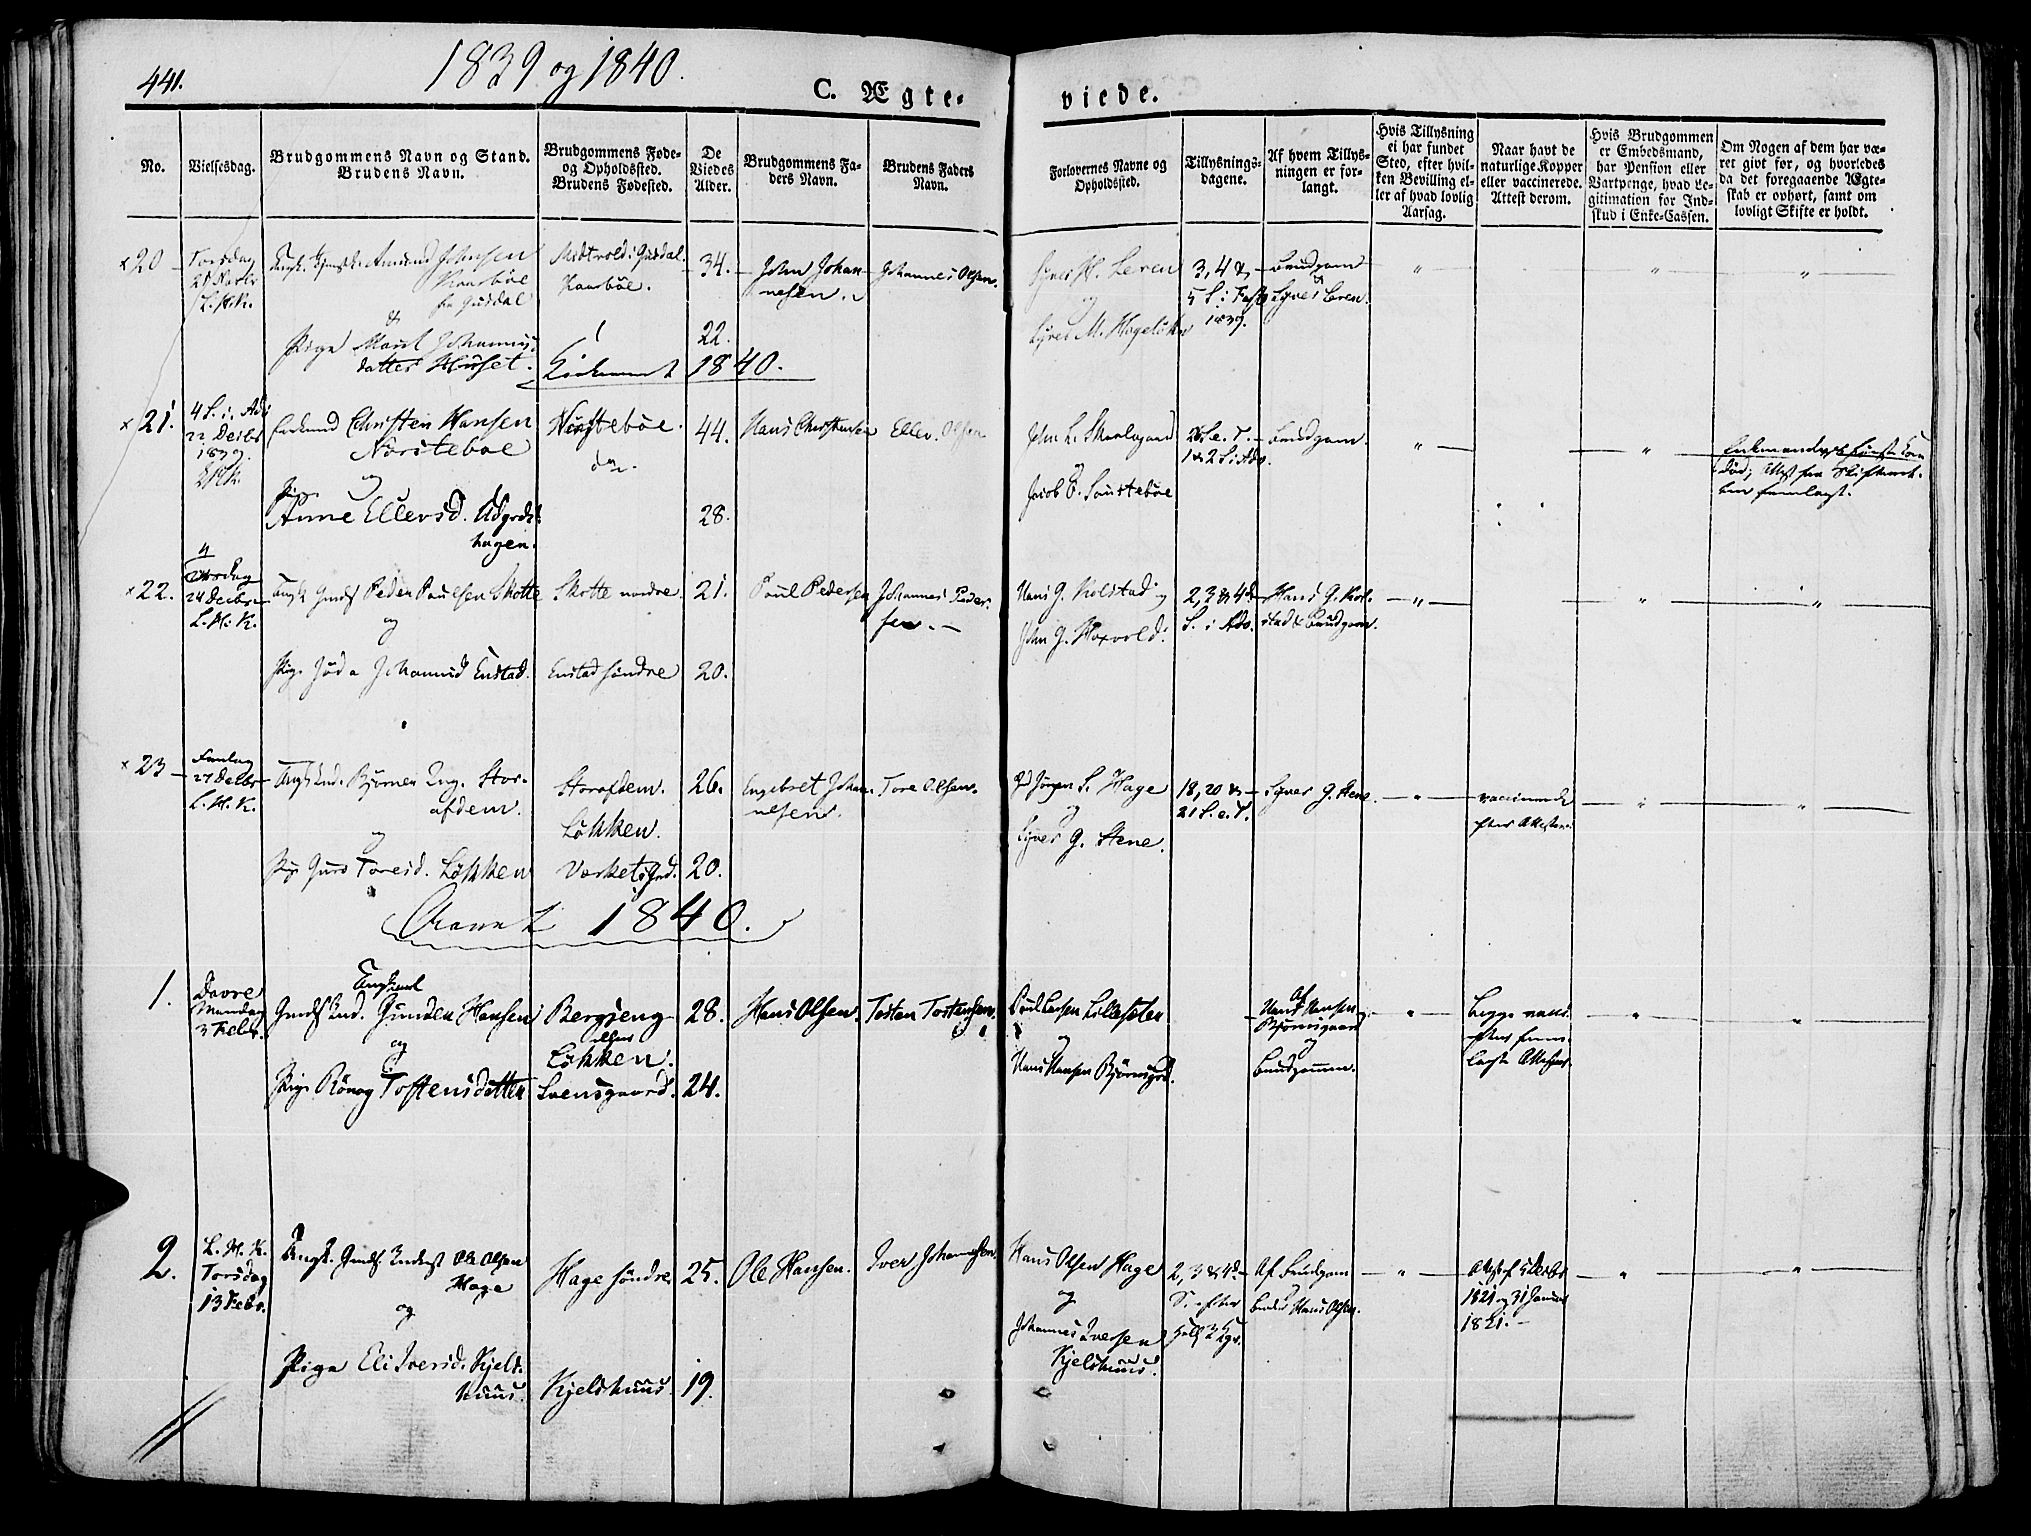 SAH, Lesja prestekontor, Ministerialbok nr. 5, 1830-1842, s. 441